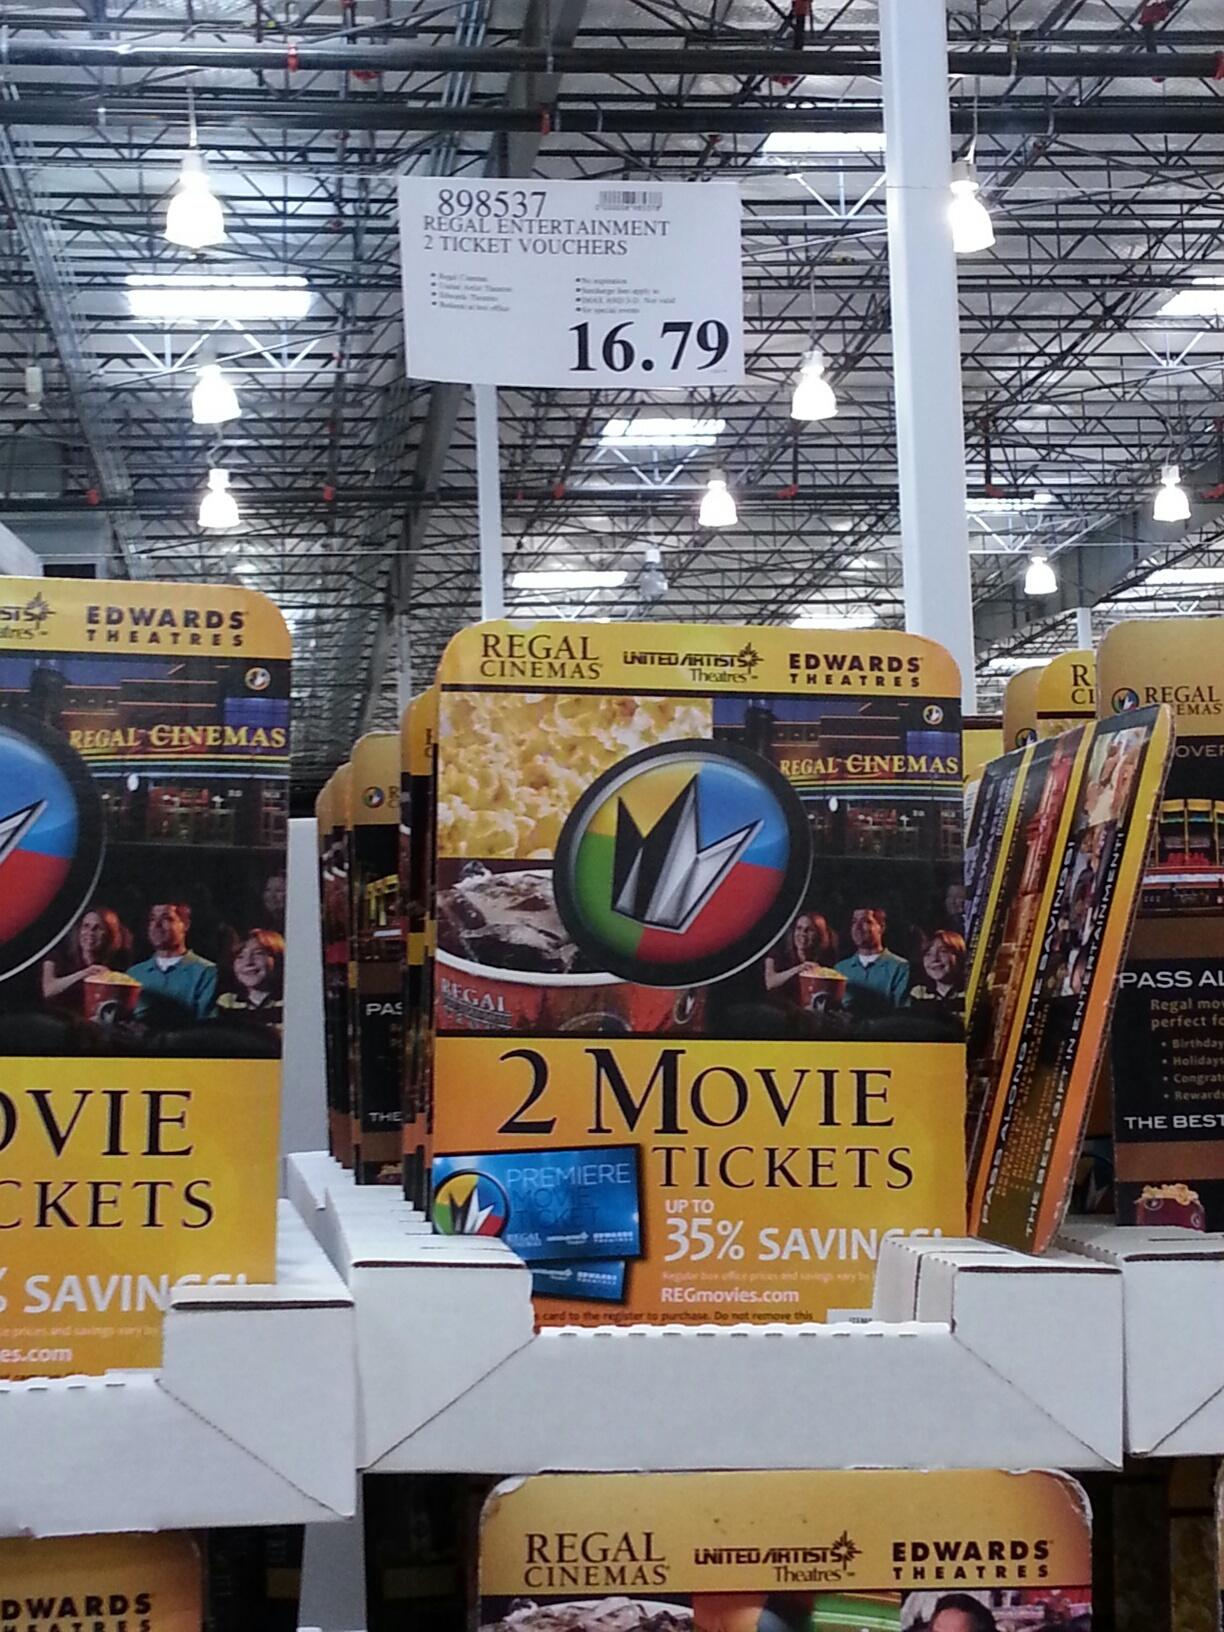 Regal Cinemas: Free Small Popcorn Coupon - The Coupon Project - Regal Cinema Free Popcorn Printable Coupons